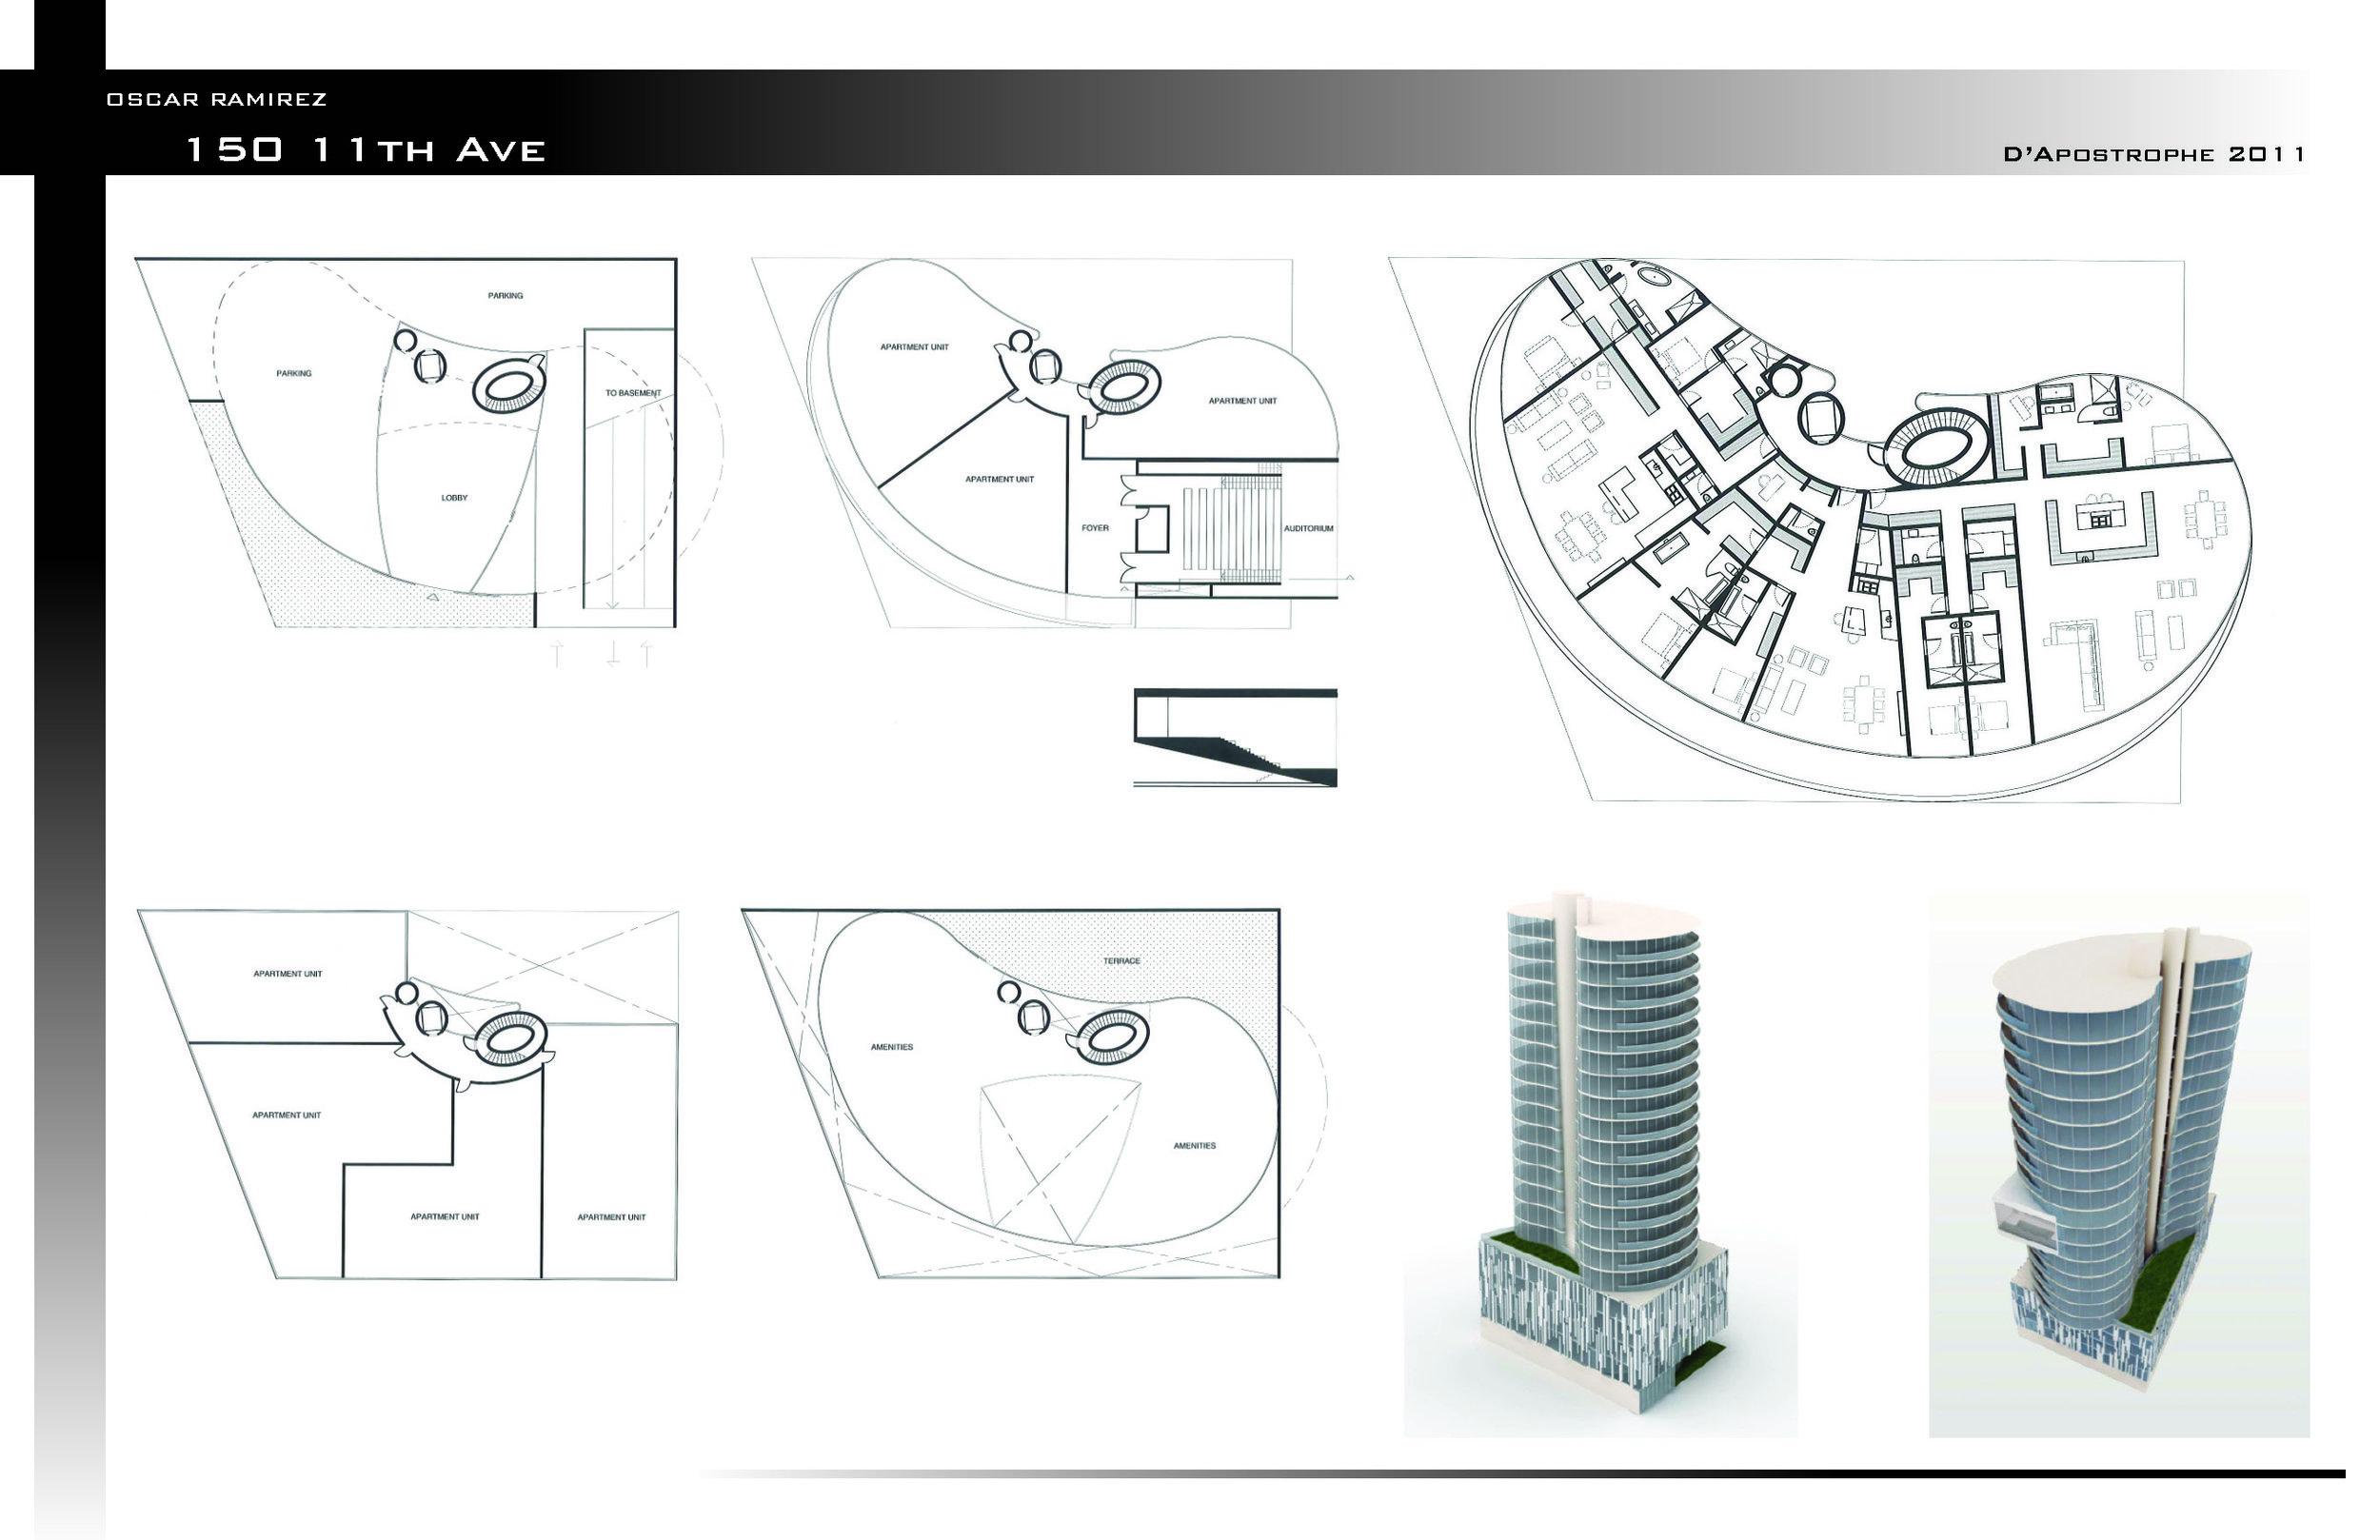 Portfolio 2012 Edition_Page_21.jpg